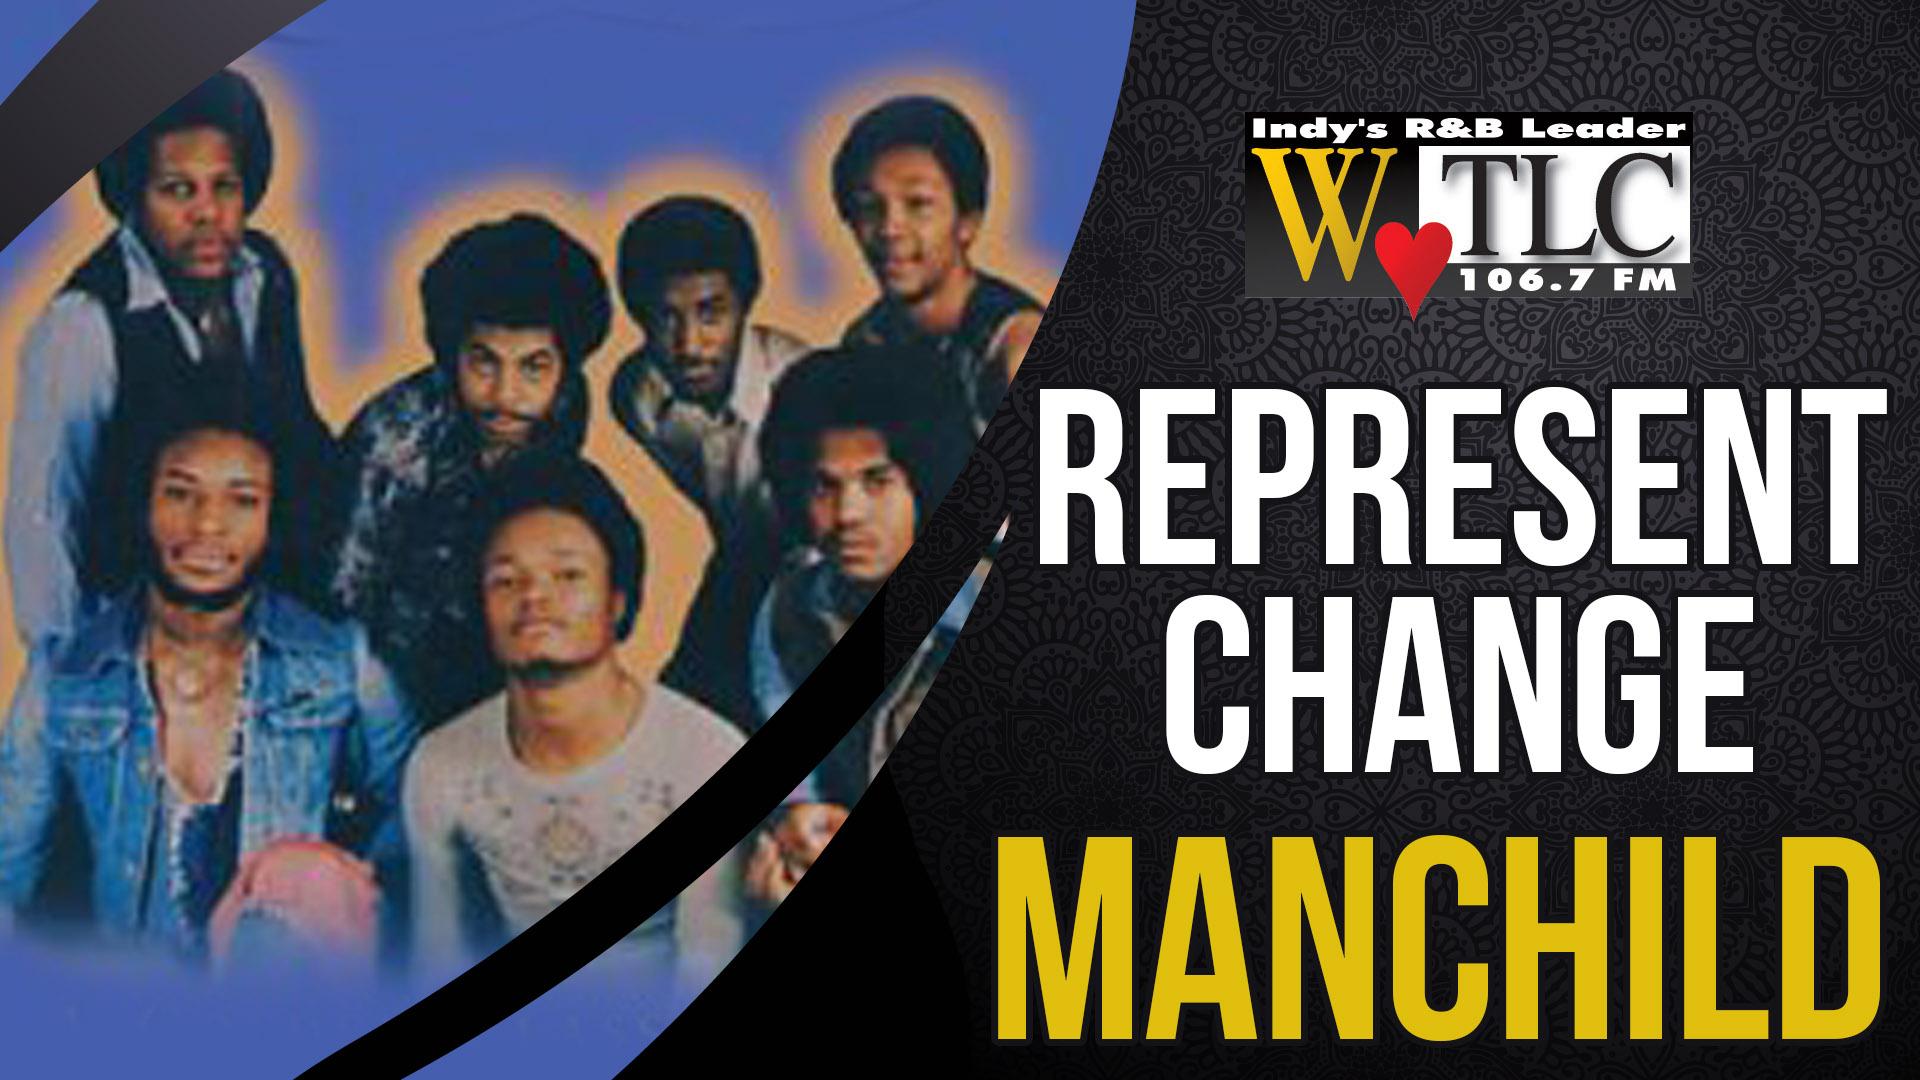 Represent Change: Manchild (WTLC)